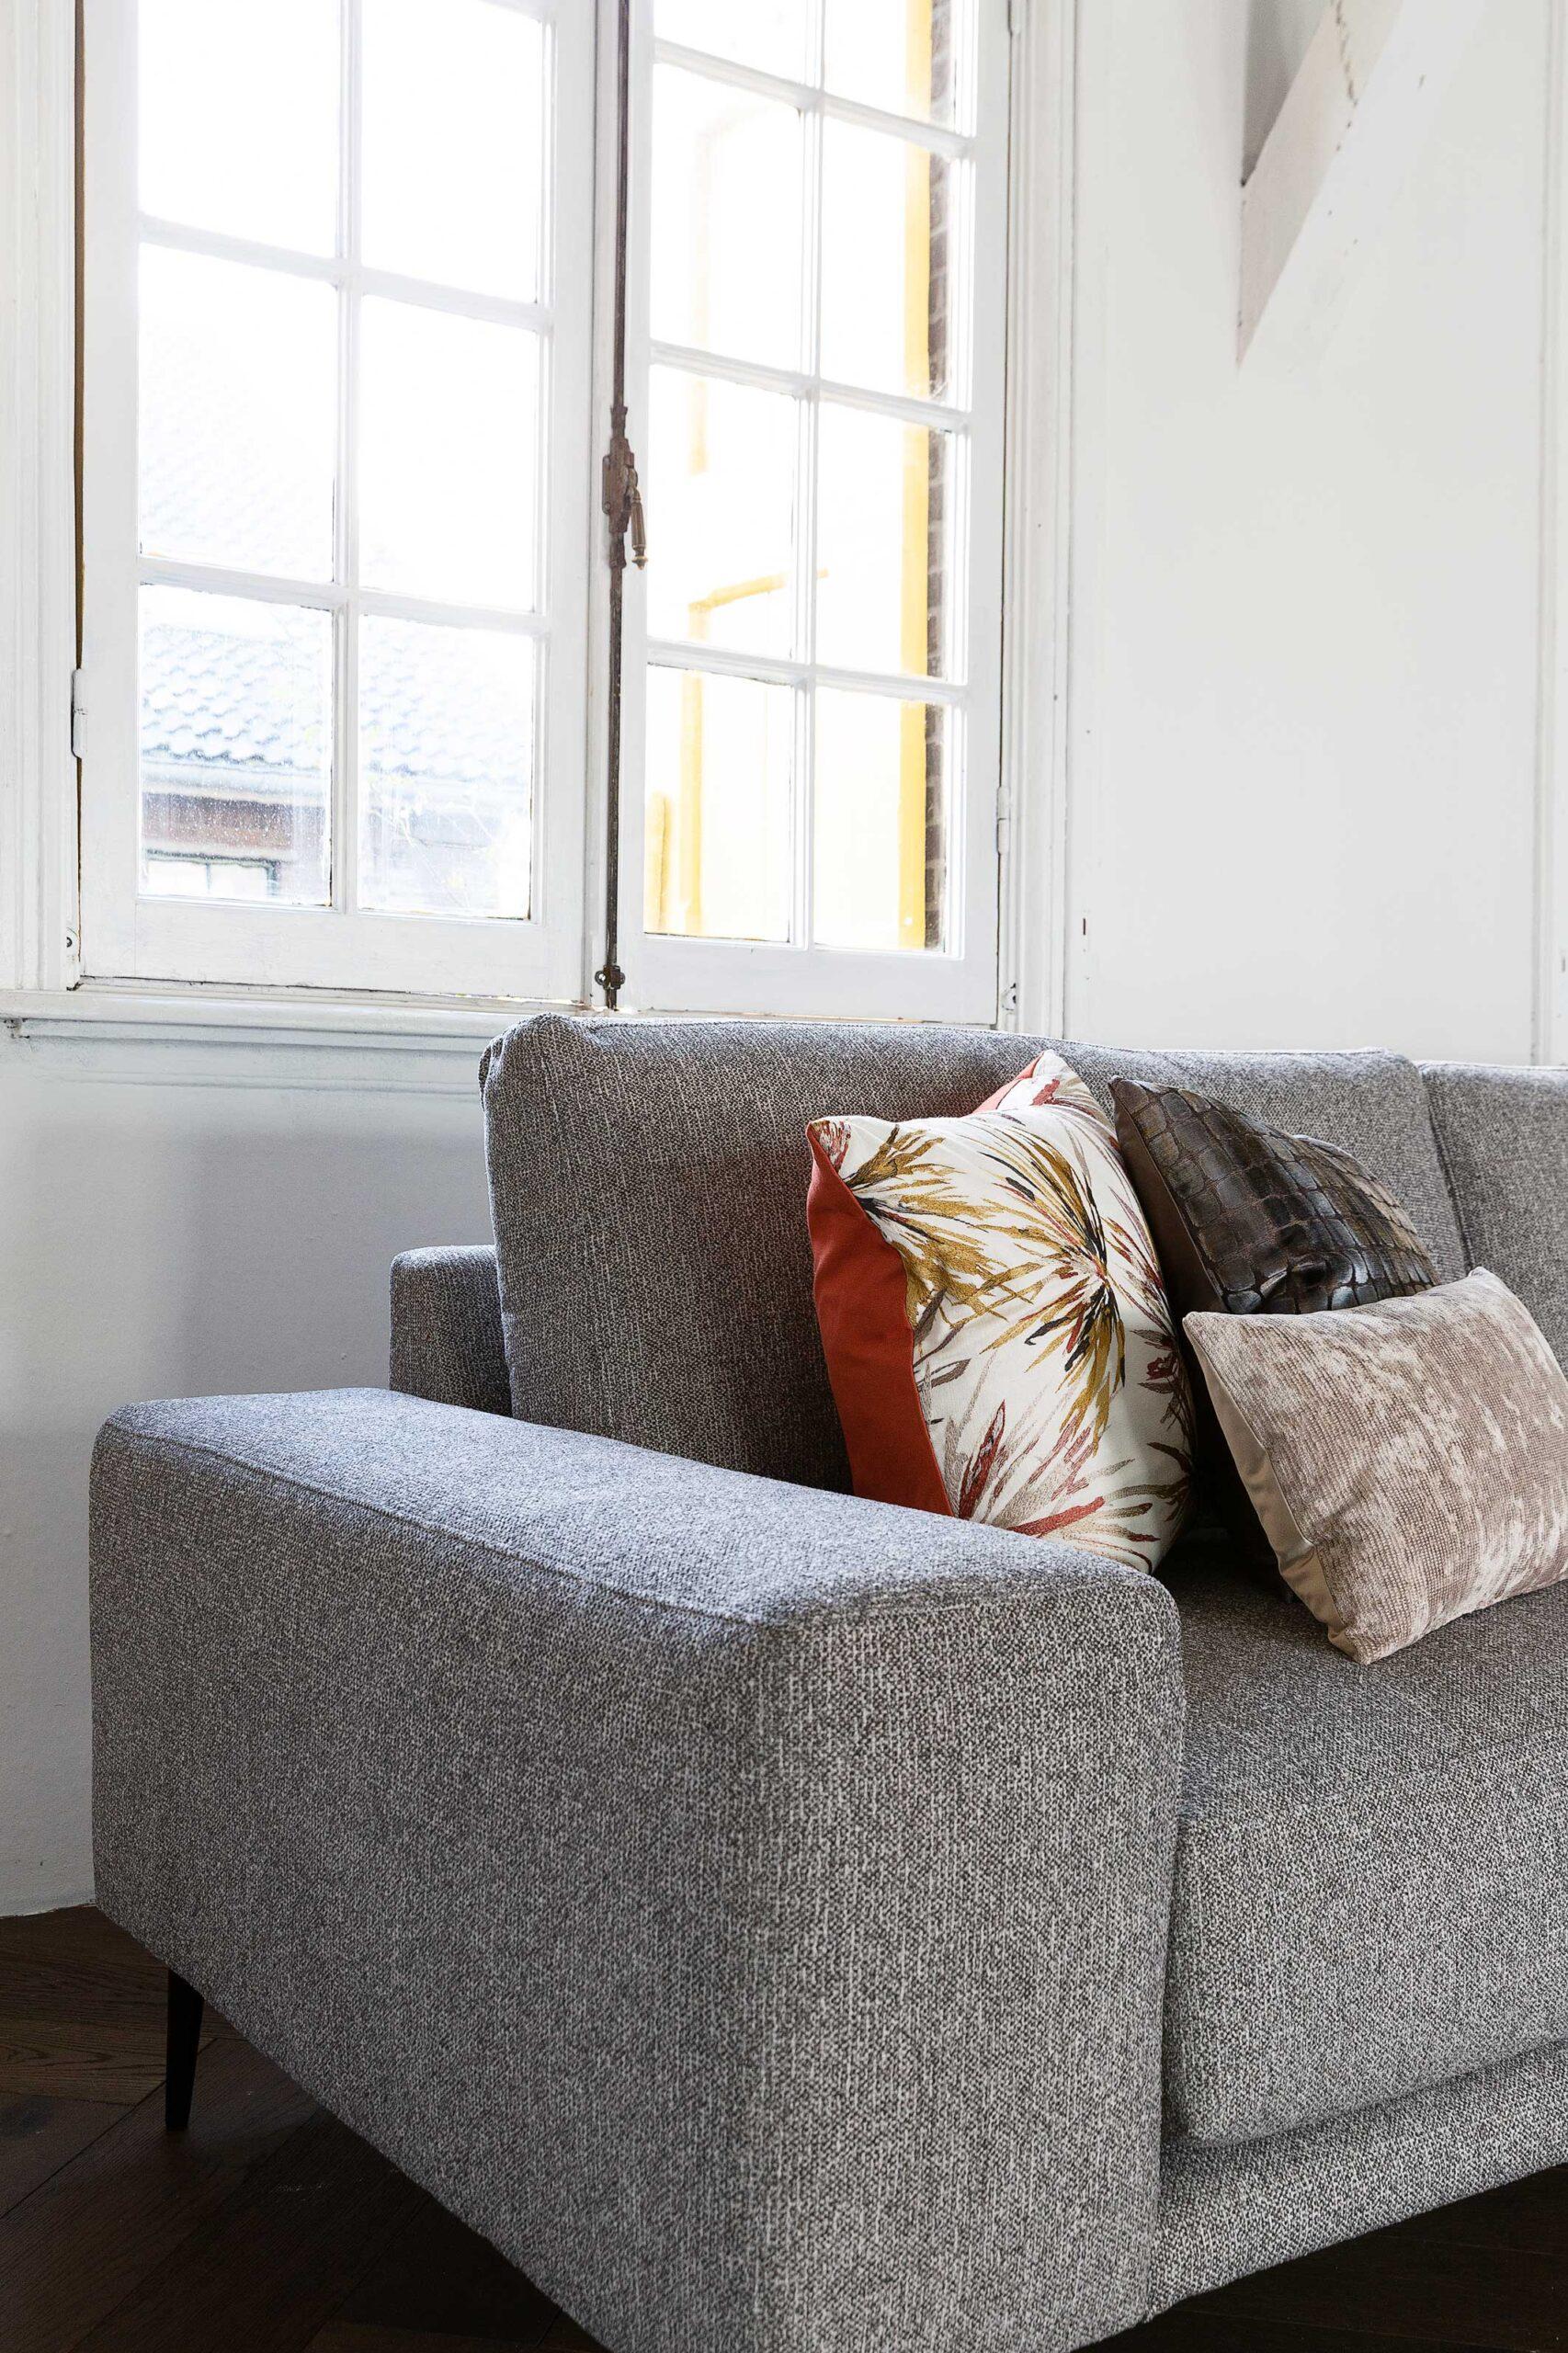 bella-milano-hoekbank-detailfoto-armleuning-soofs-interieur